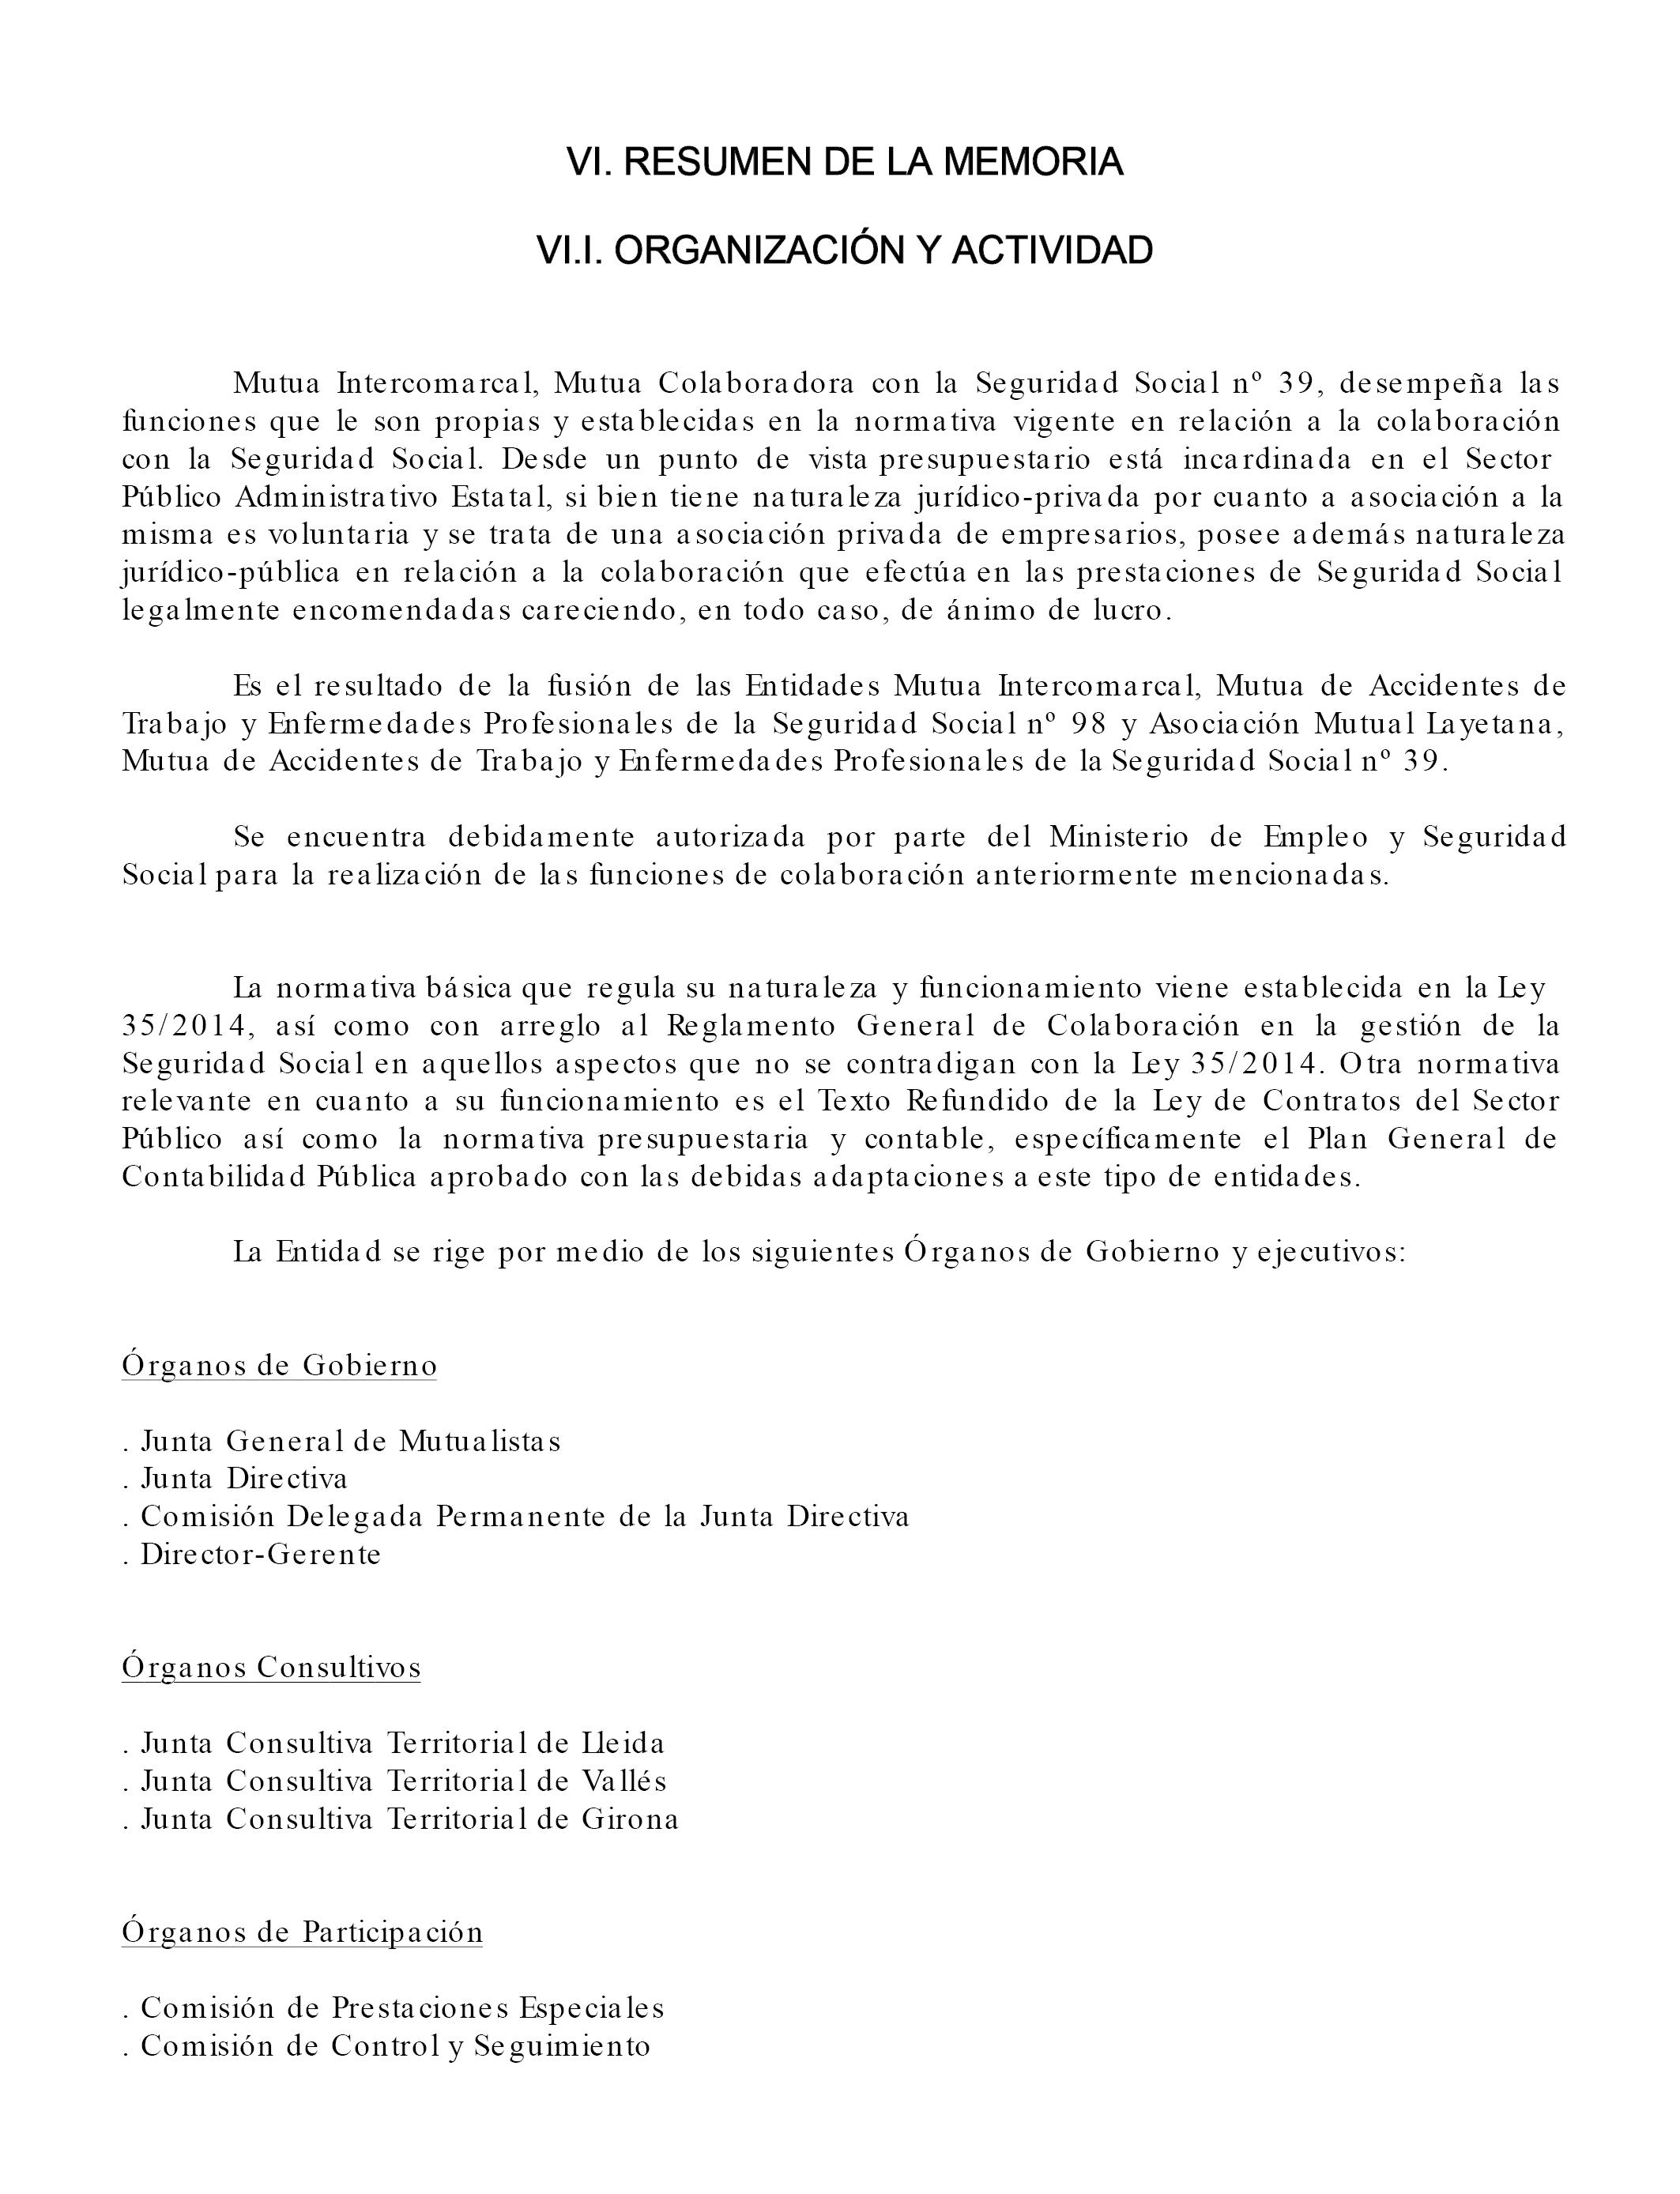 BOE.es - Documento BOE-A-2017-14316